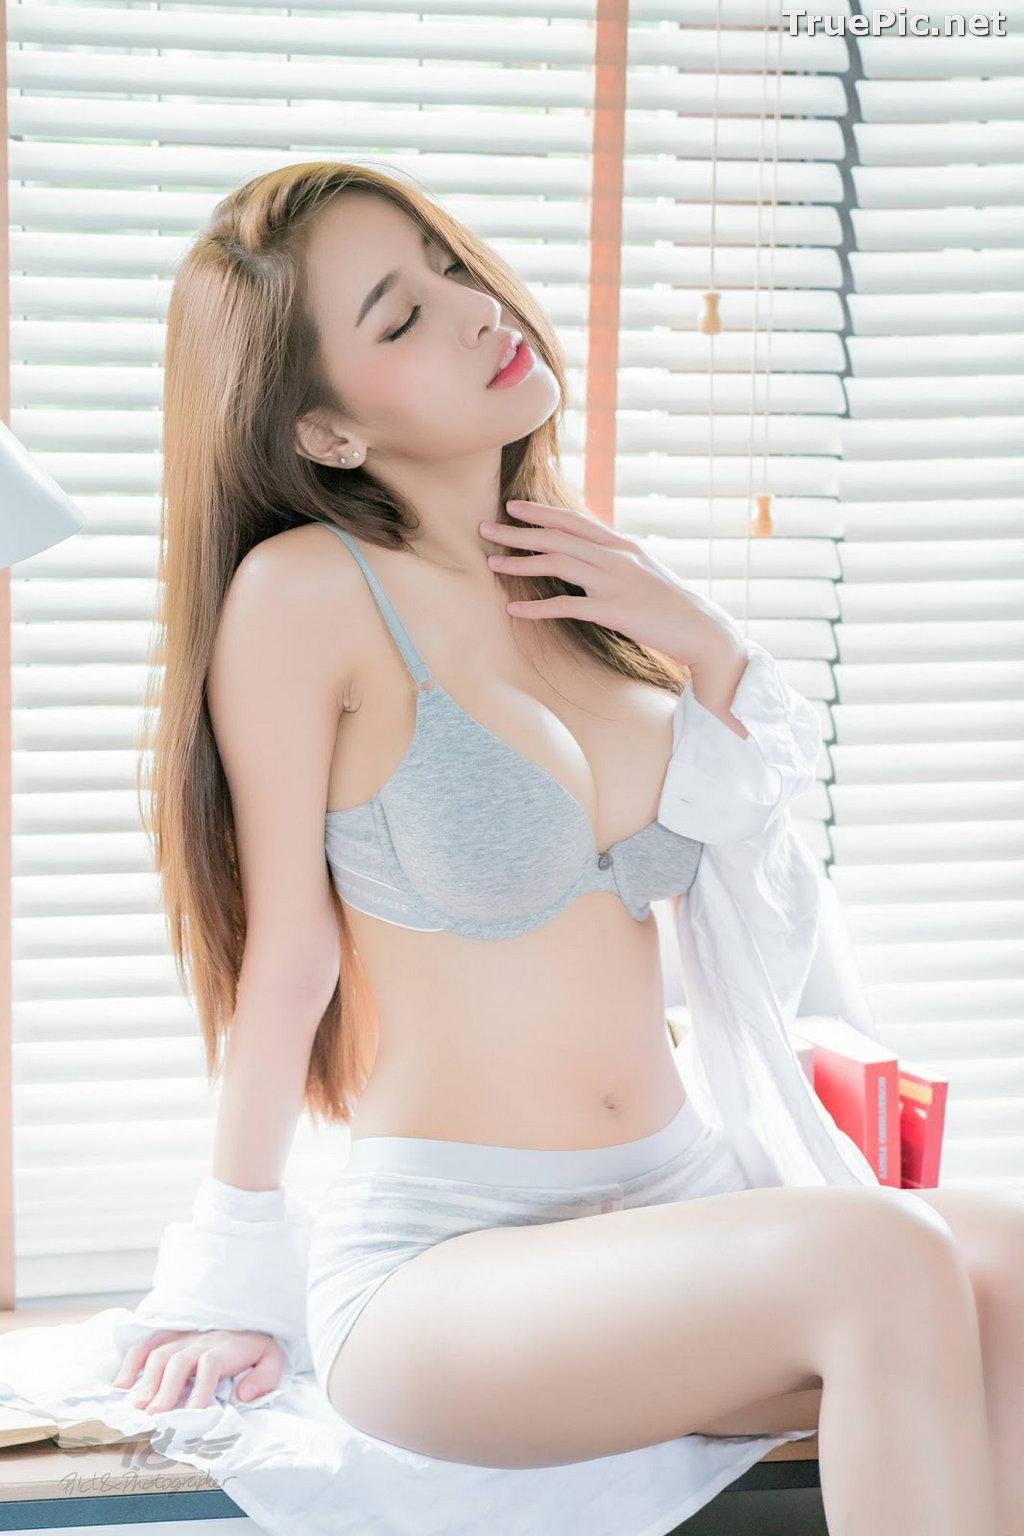 Image Thailand Sexy Model - Pichana Yoosuk - Waiting For Love - TruePic.net - Picture-8